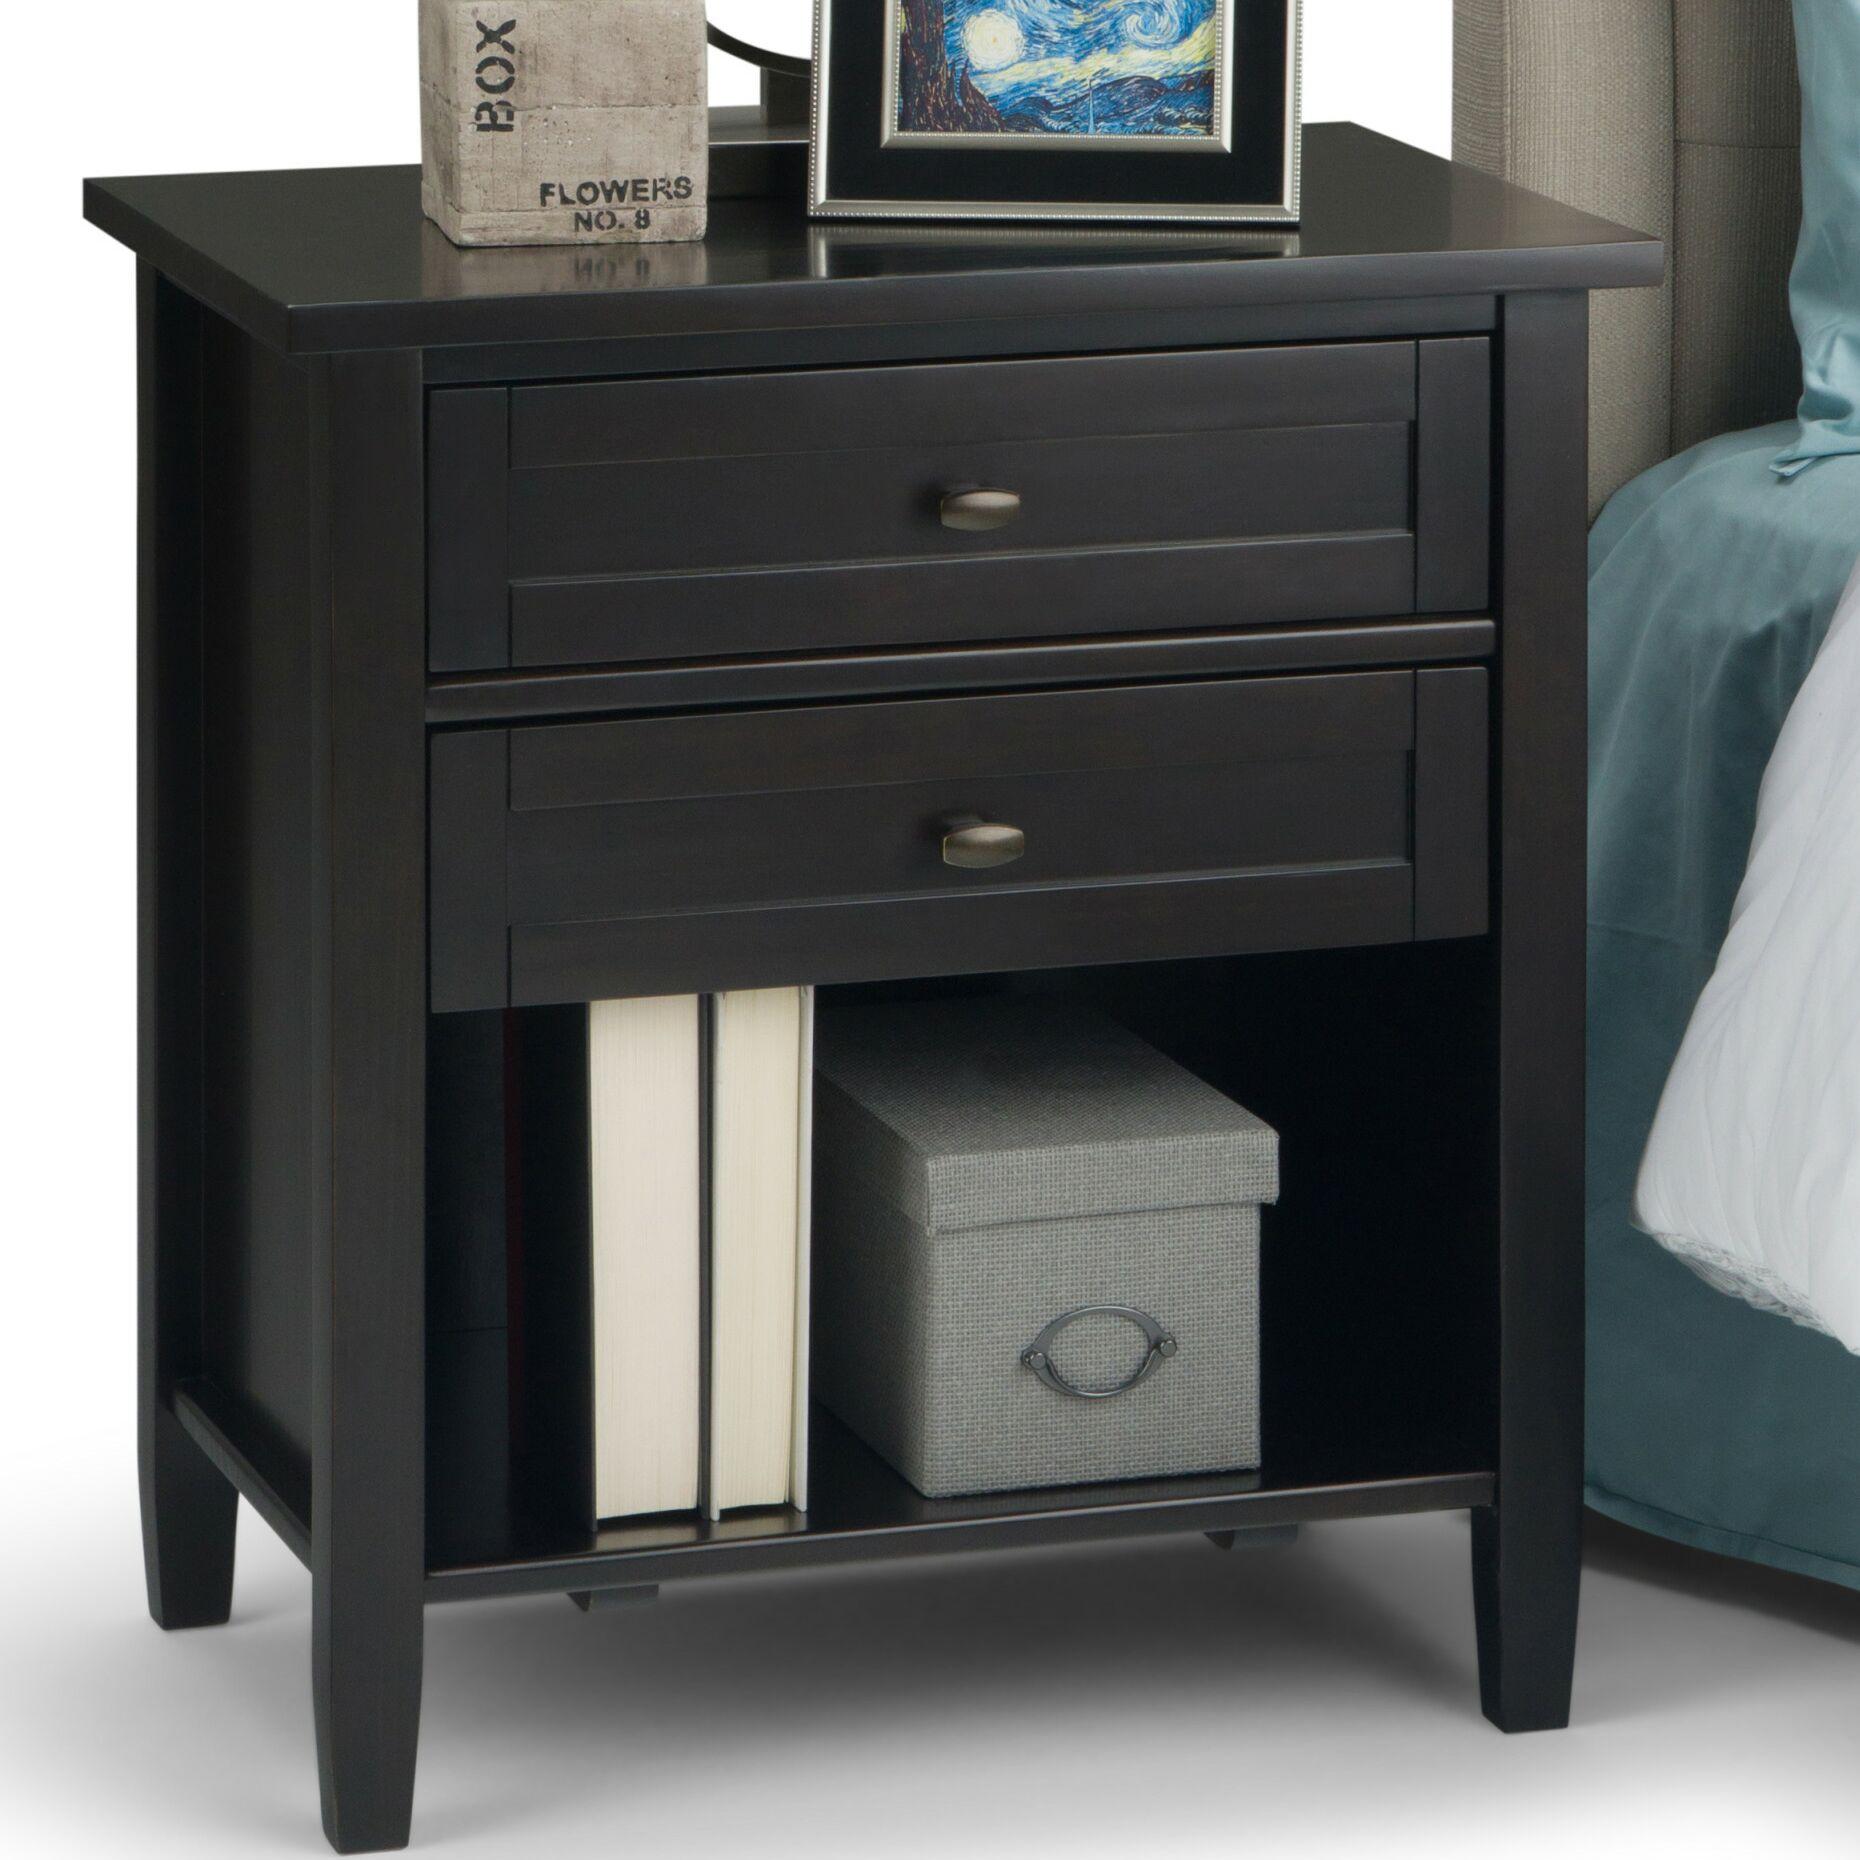 Warm Shaker 2 Drawer Nightstand Color: Dark Brown